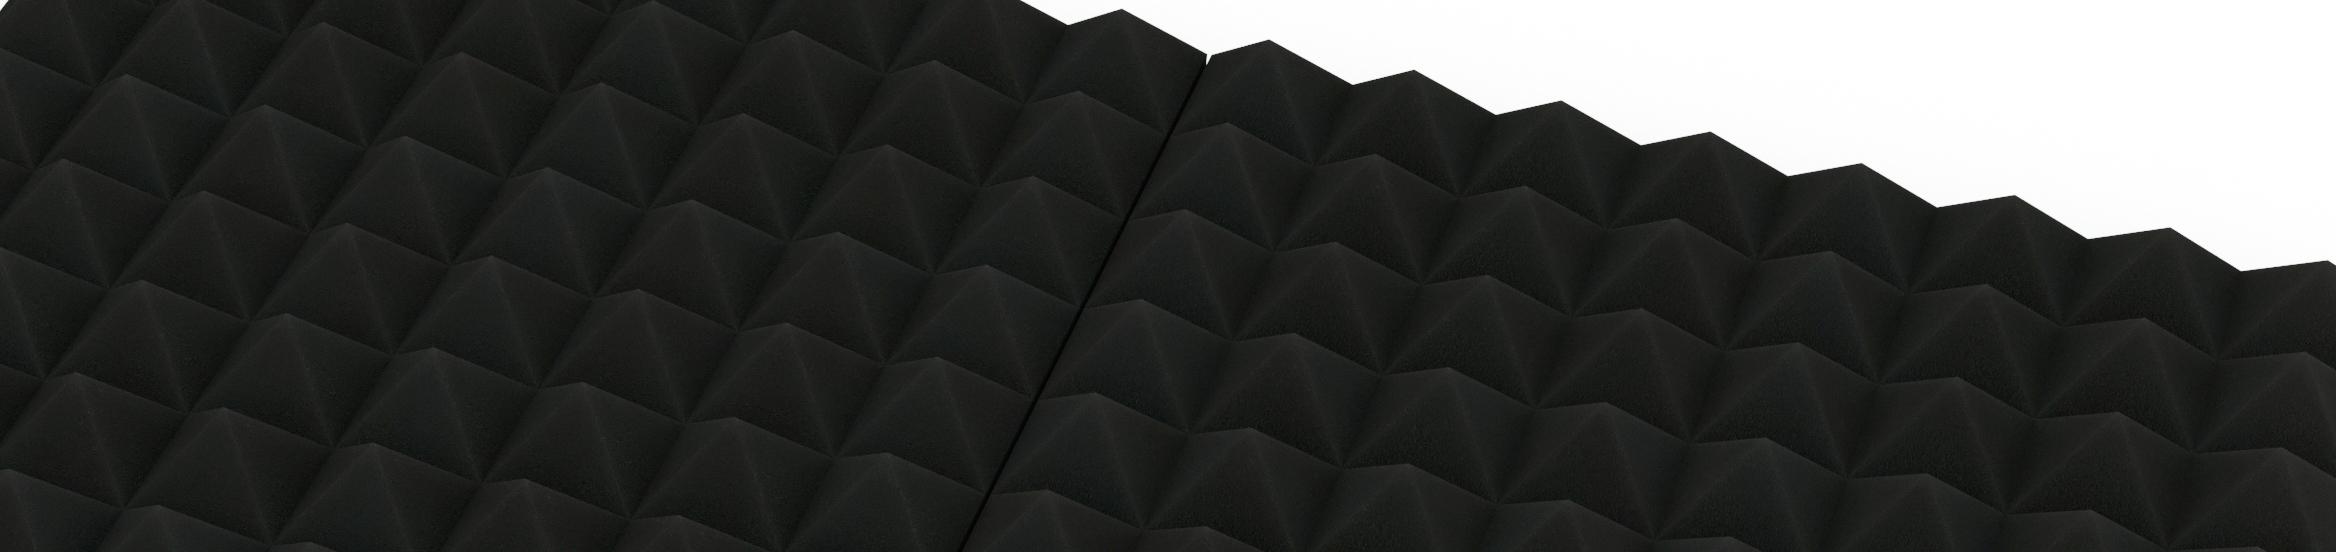 Material Fonoabsorbente